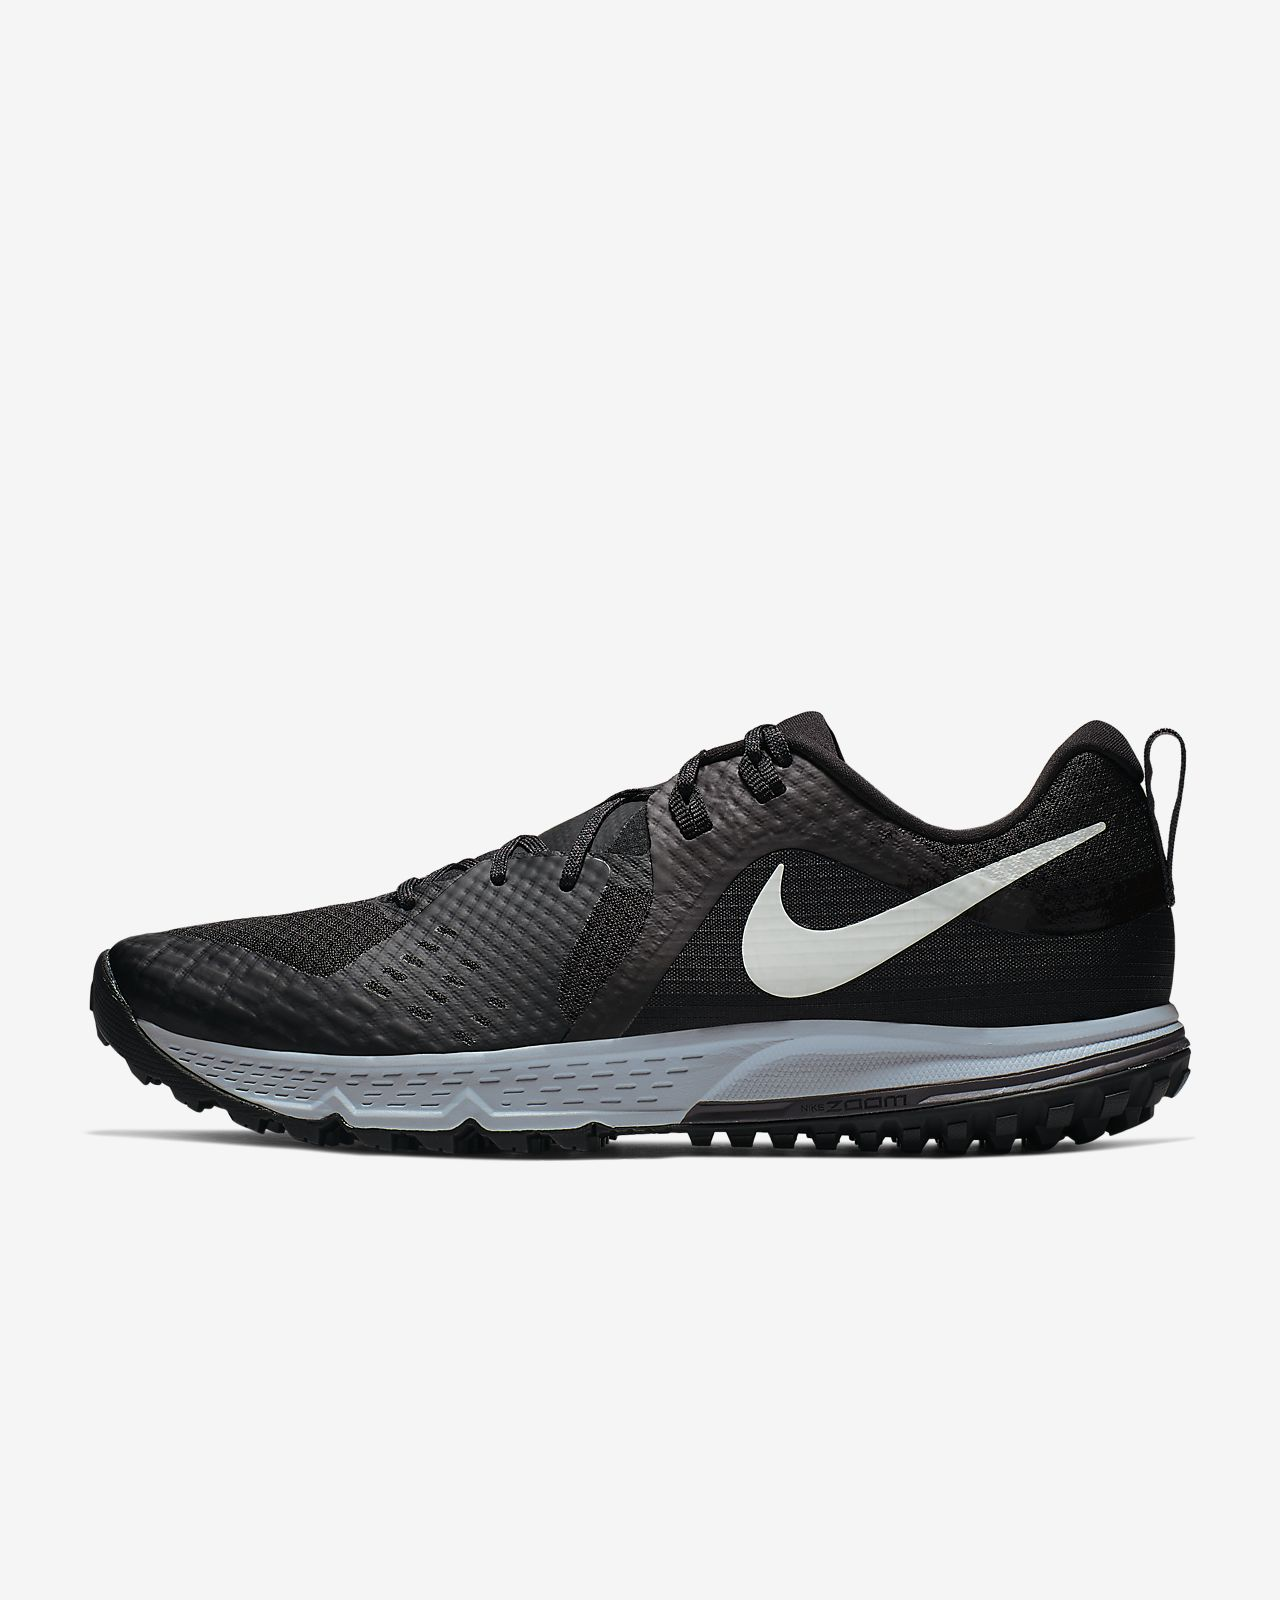 nike air huarache run ultra, Nike Flex Trail 2 Men's Running